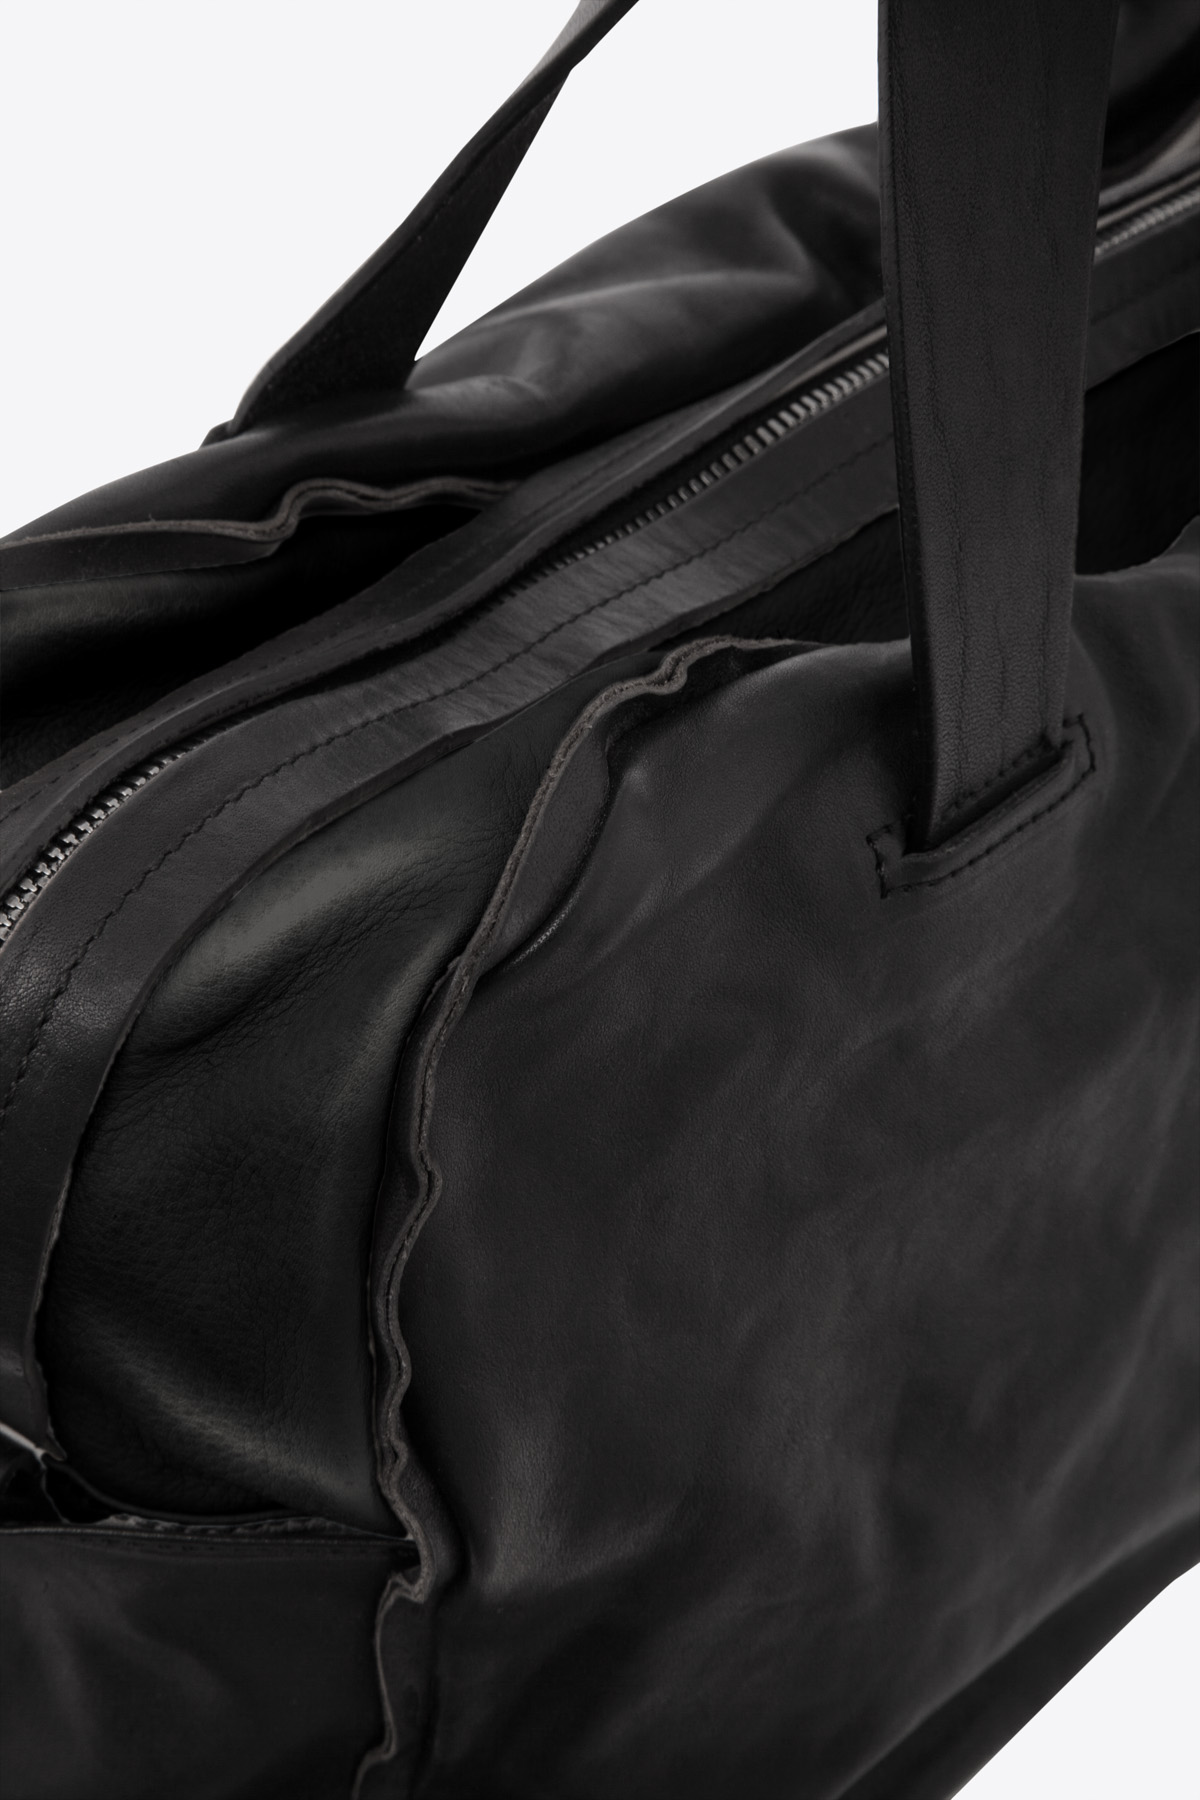 dclr012-lastnite-a1-black-detail